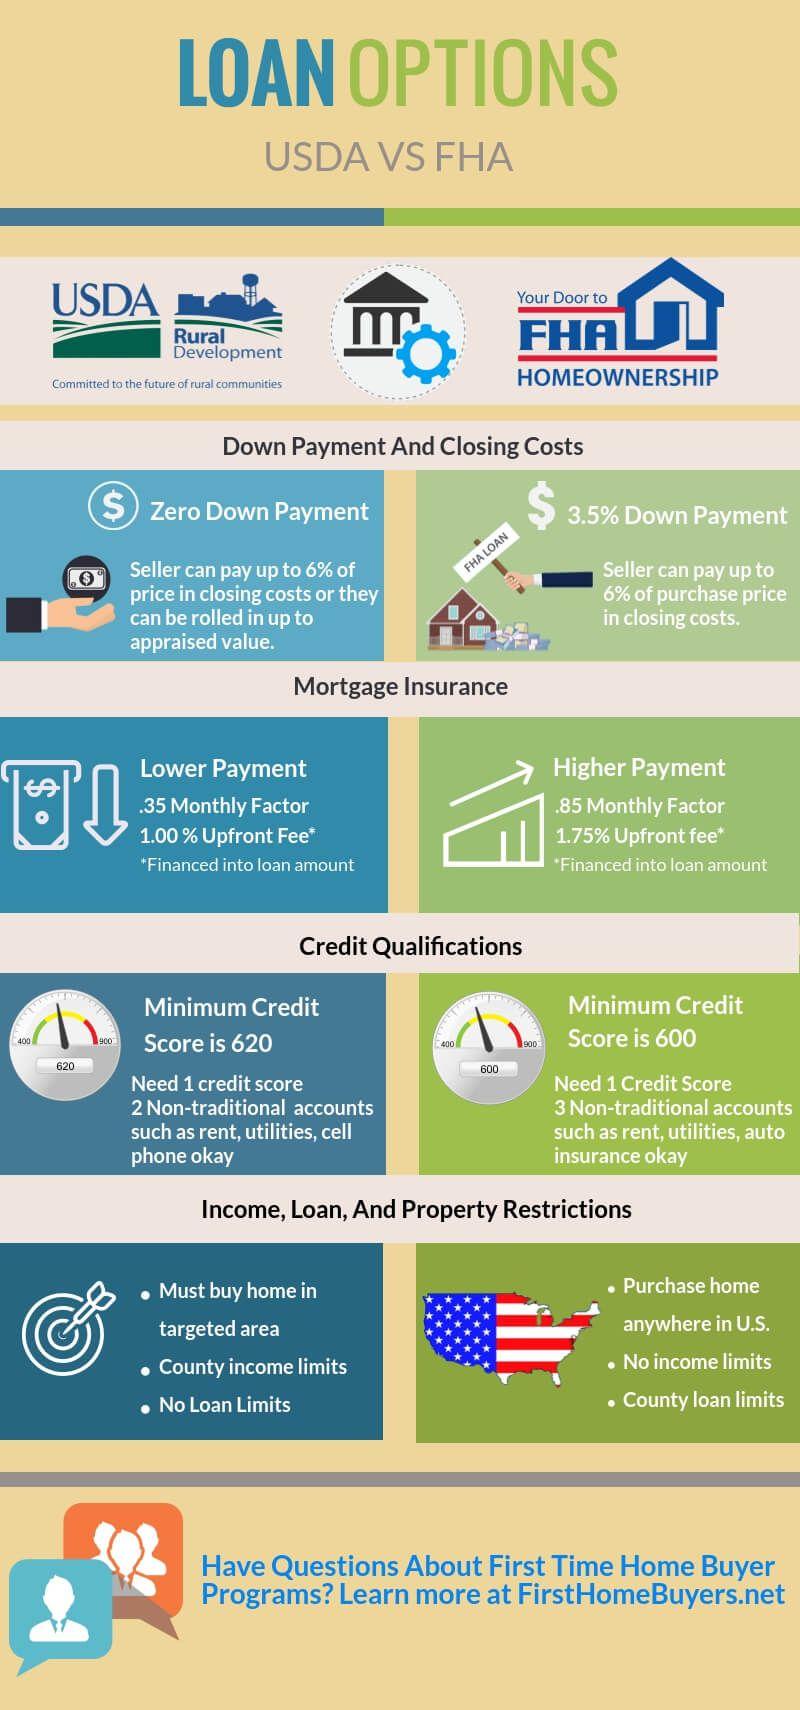 Usda Better Program Vs Fha Fha Loans Fha First Time Home Buyers